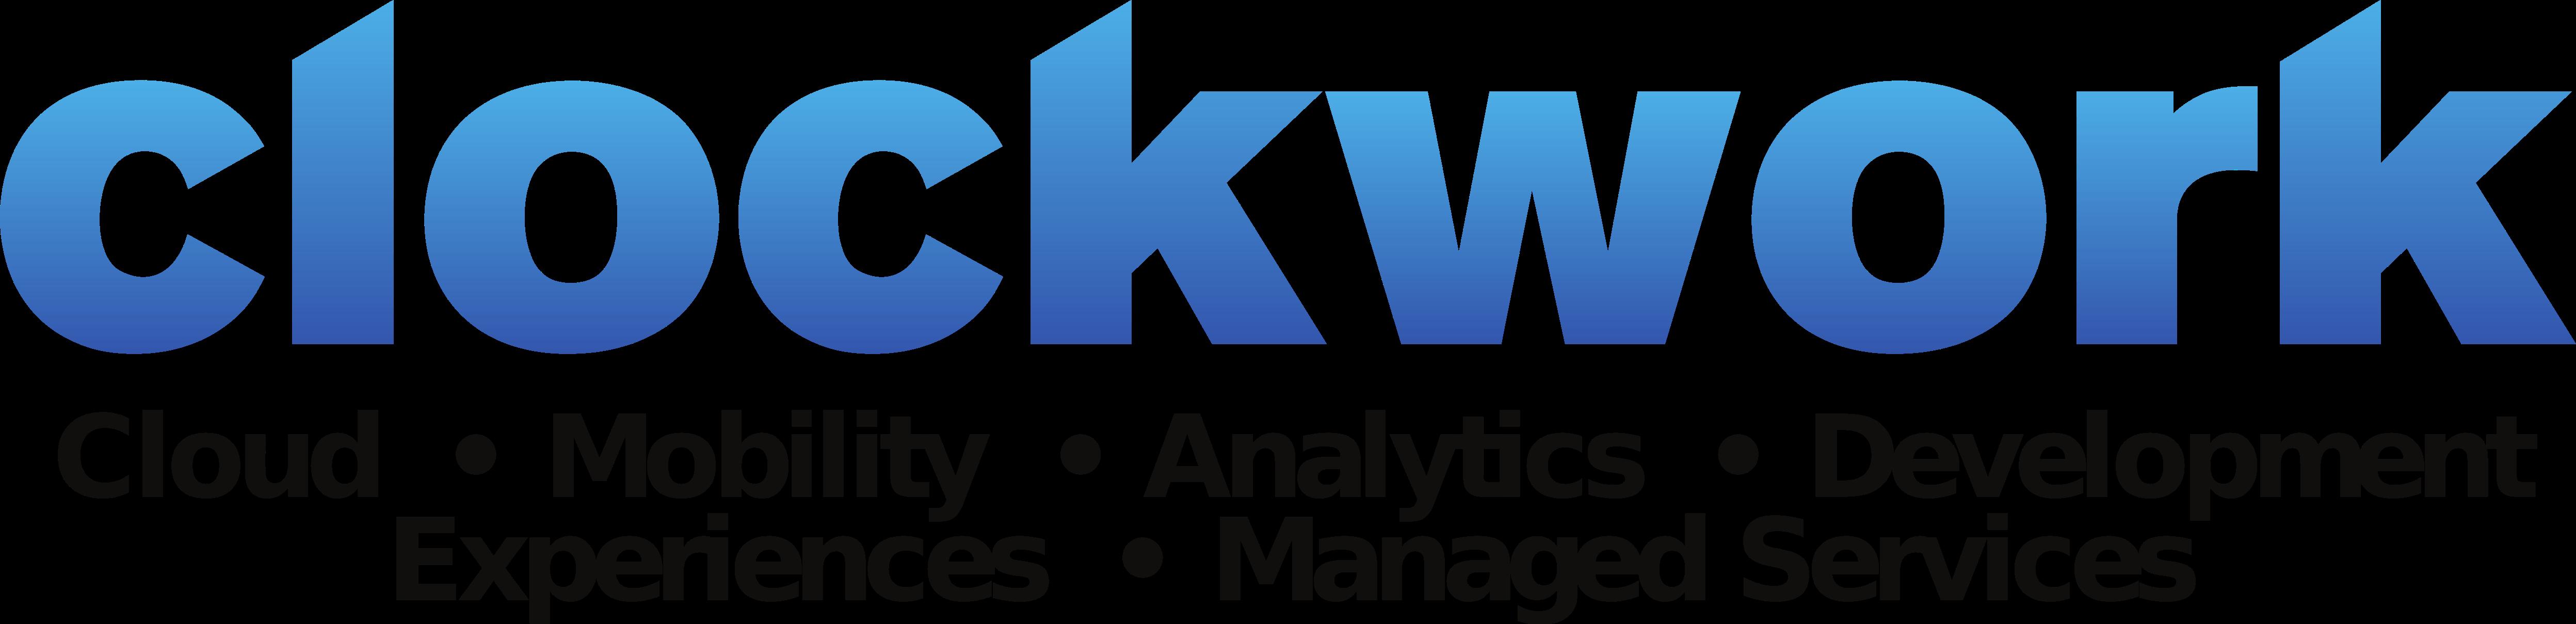 clockwork-ASUG-2020-logo